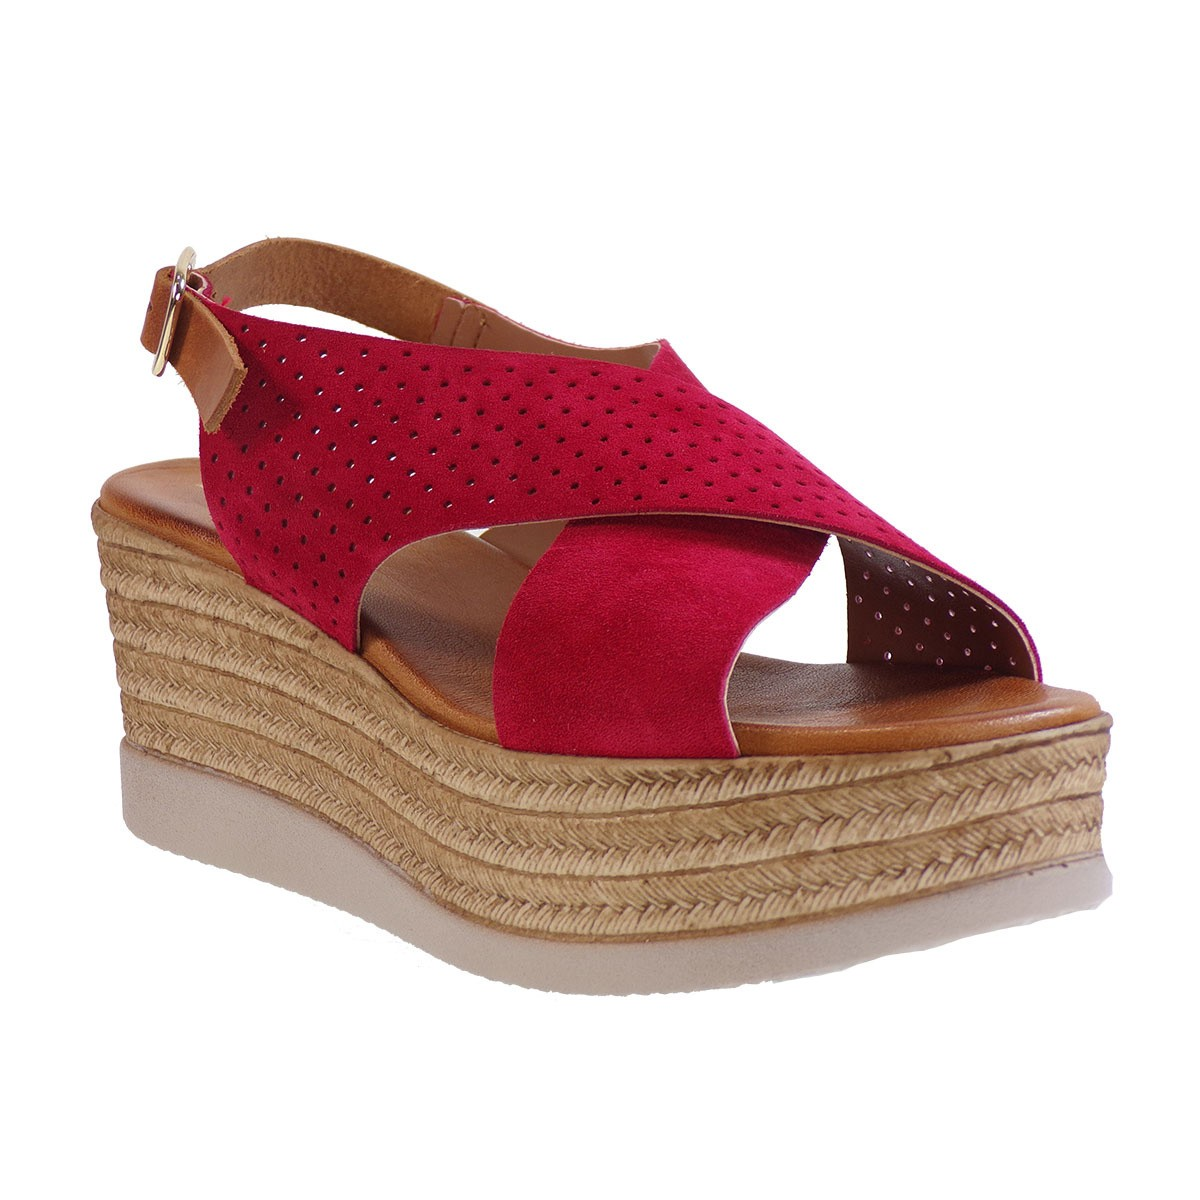 Fardoulis shoes Γυναικείες Πλατφόρμες Πέδιλα 64420 Κόκκινο Καστόρι